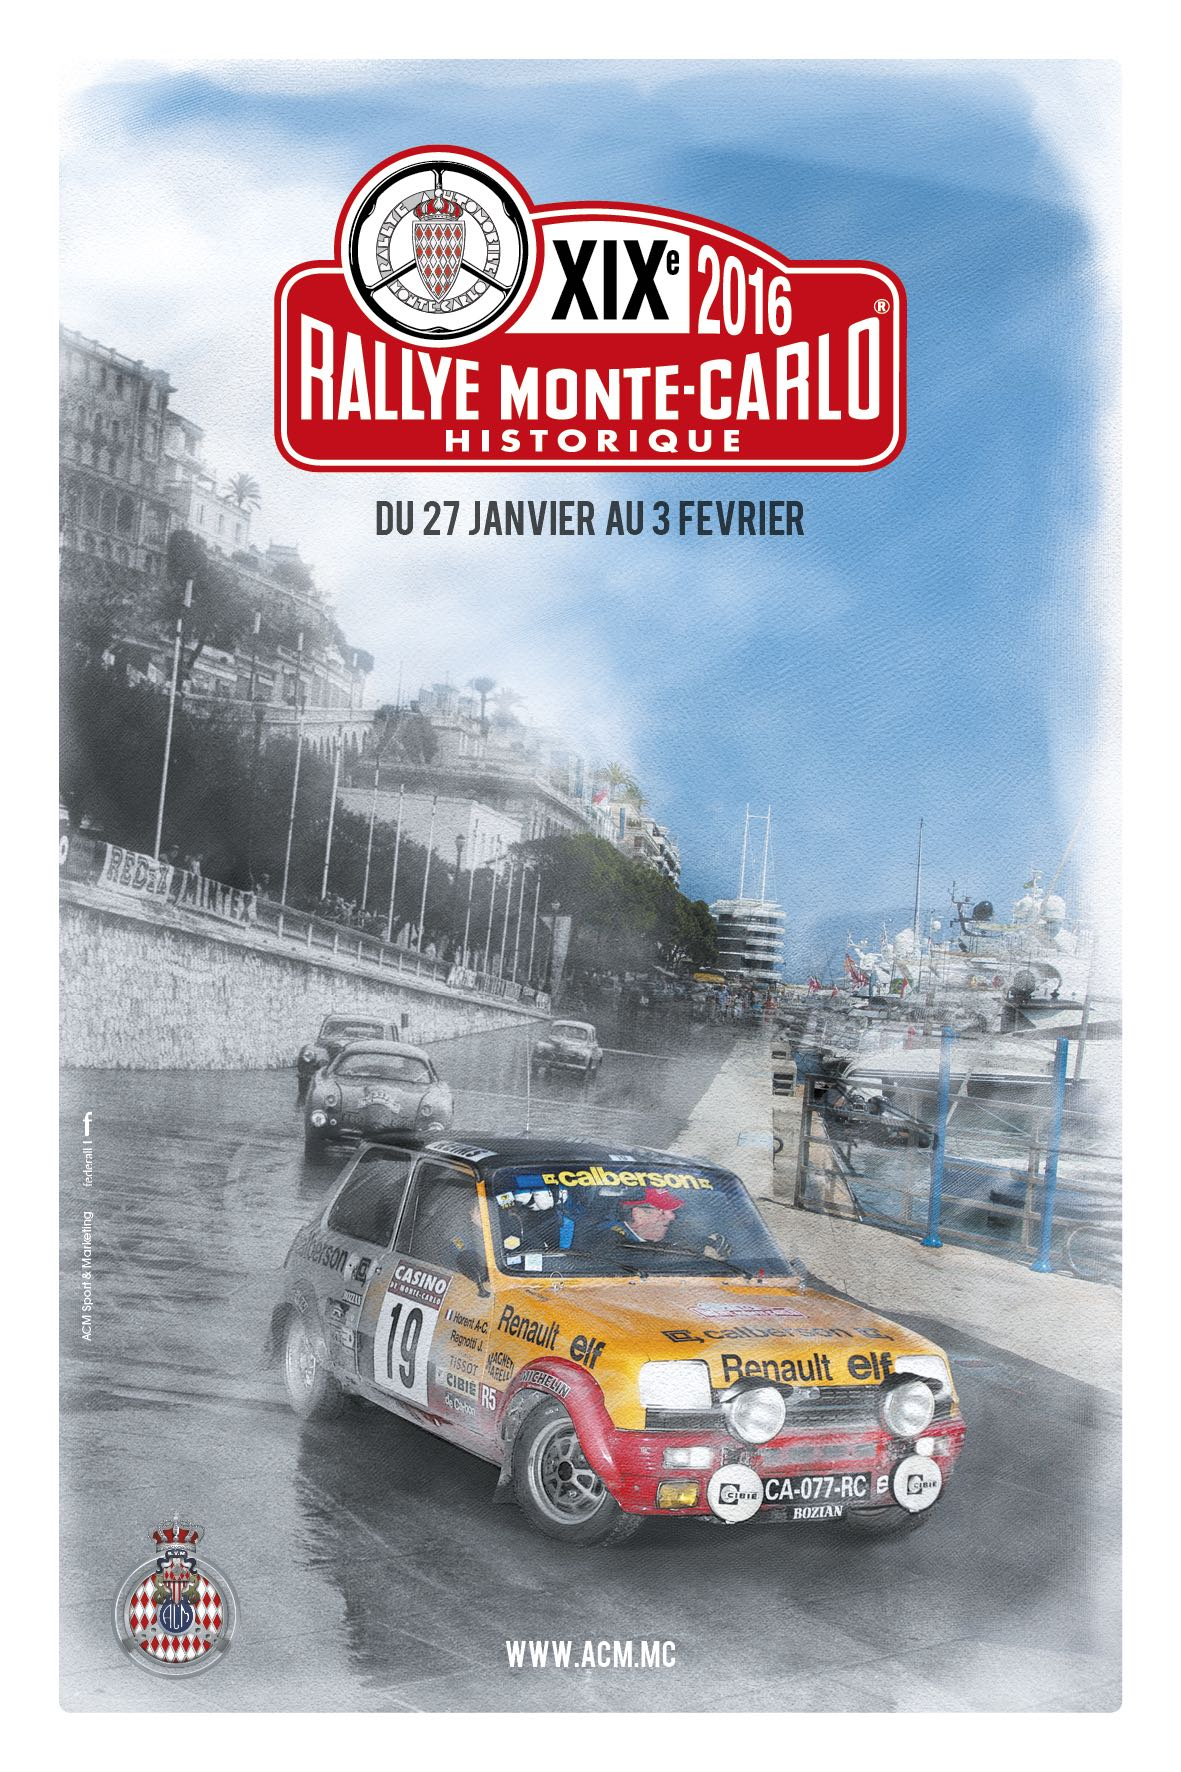 2016 Rallye Monte Carlo Historique Entry List  